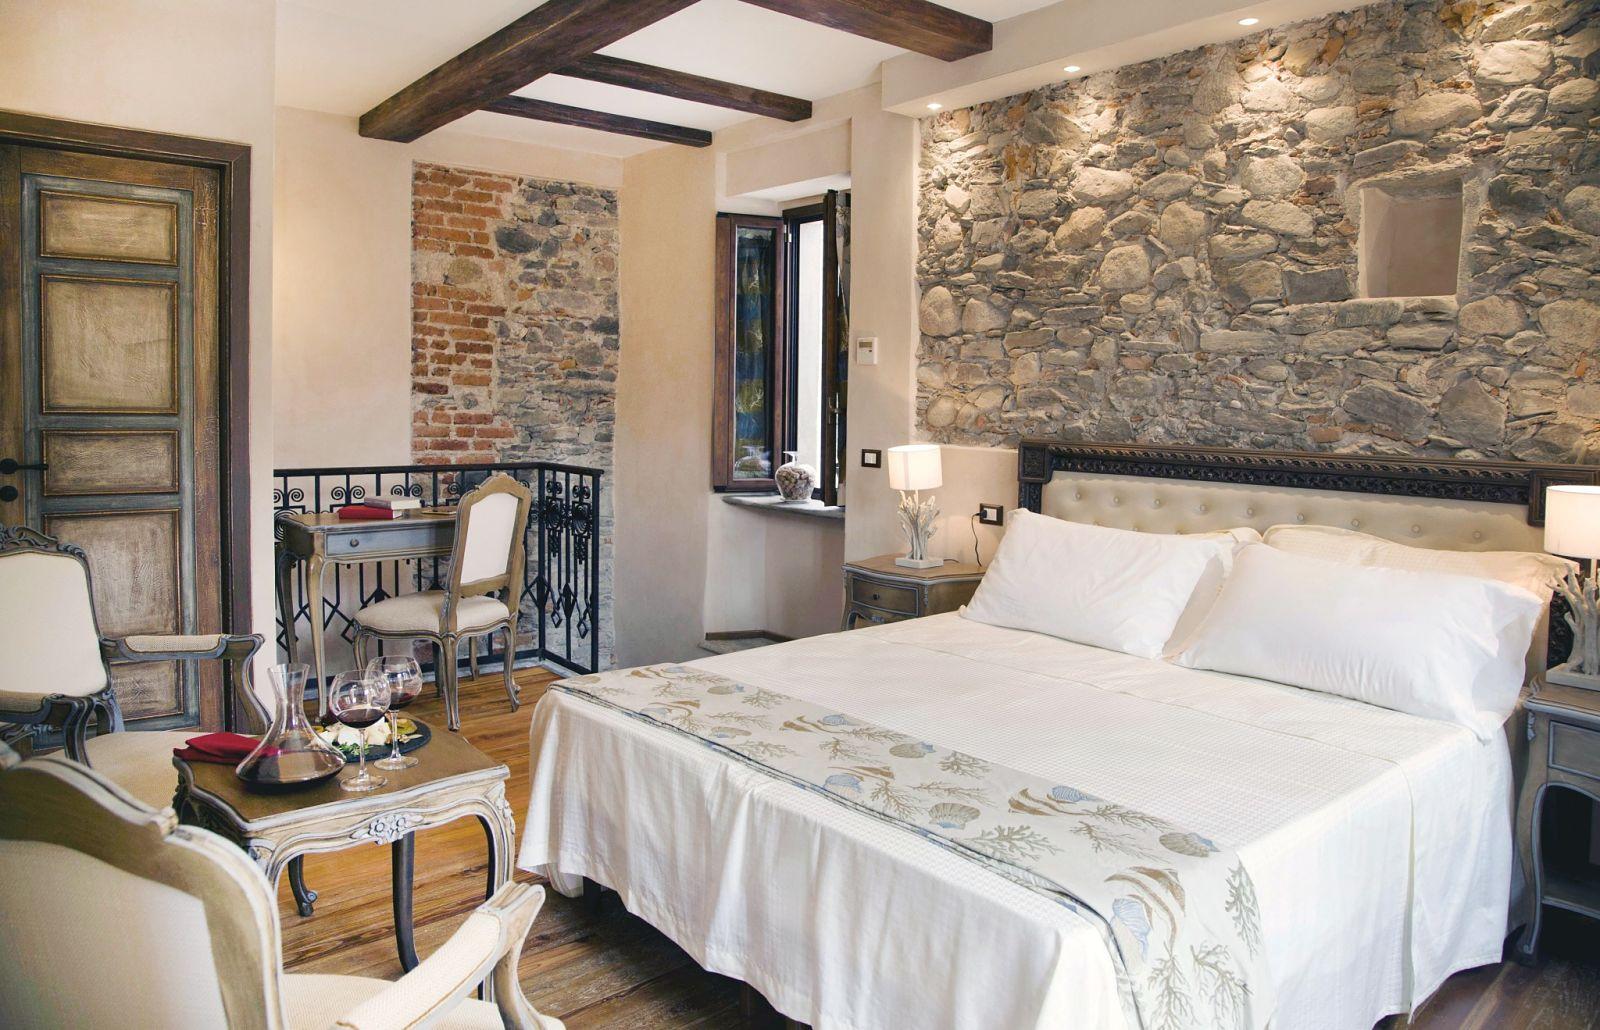 elvezia boutique hotel in isola bella in lago maggiore